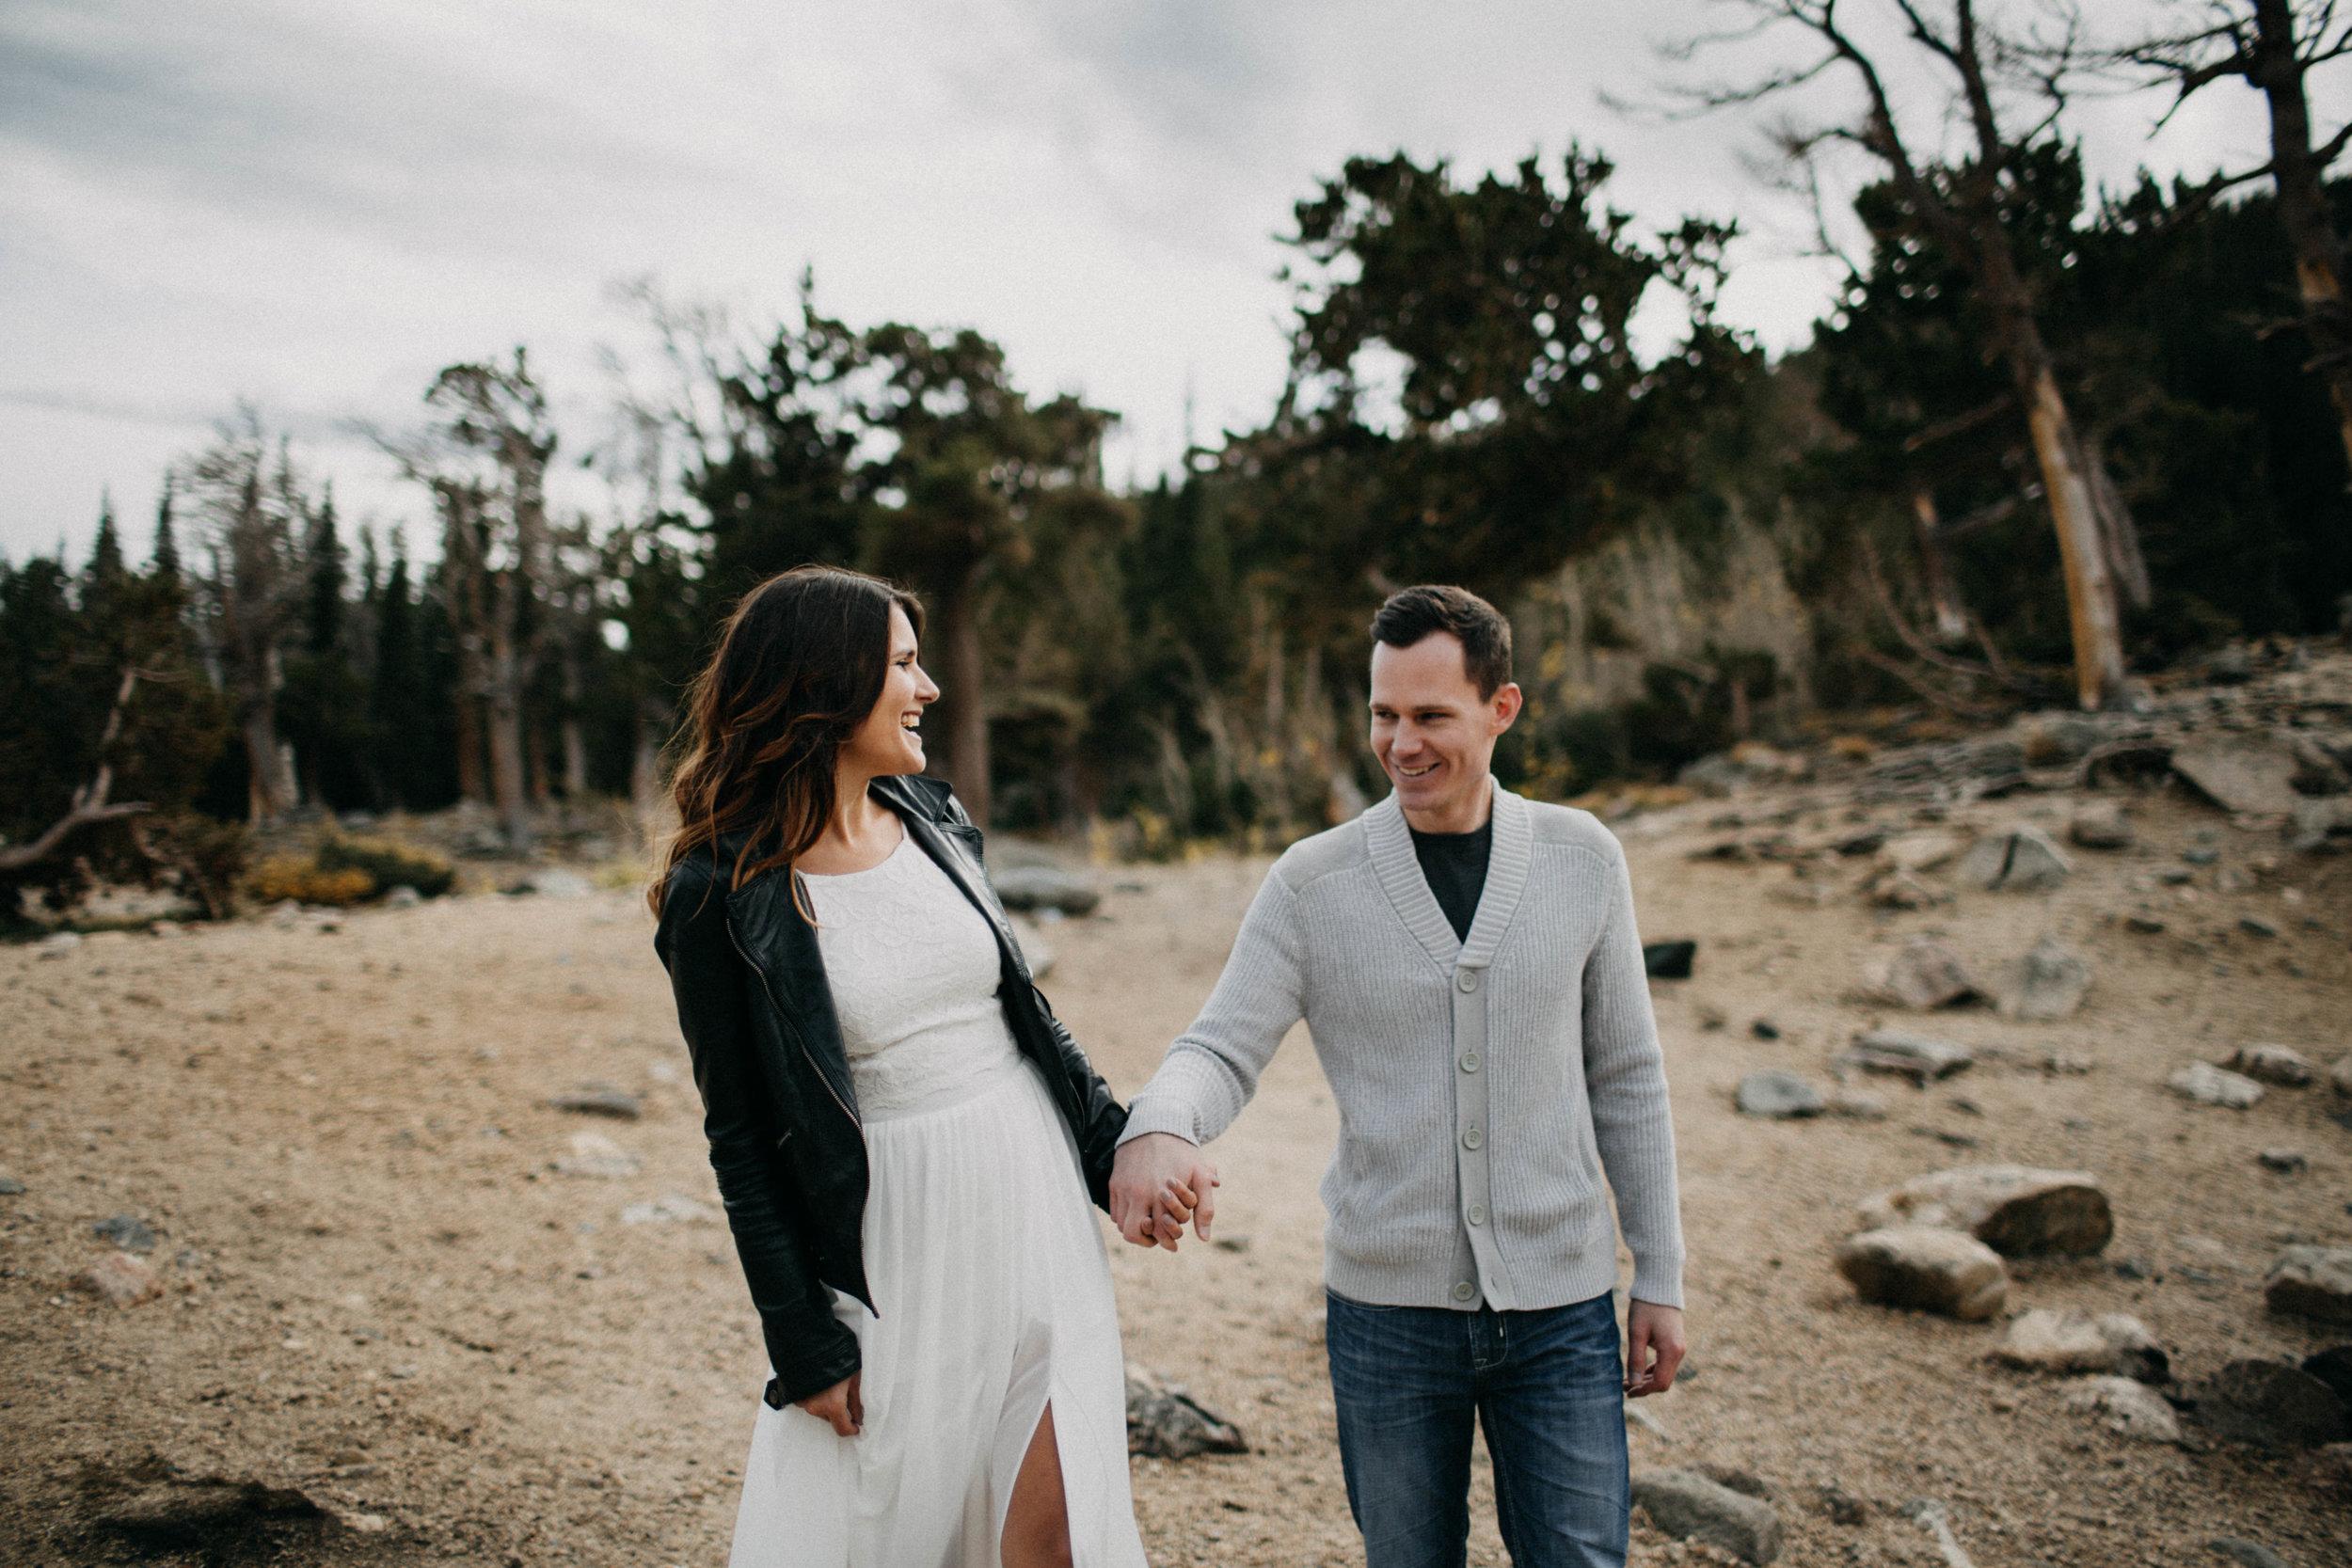 Rocky Mountain, Denver, Colorado Engagement Photographer